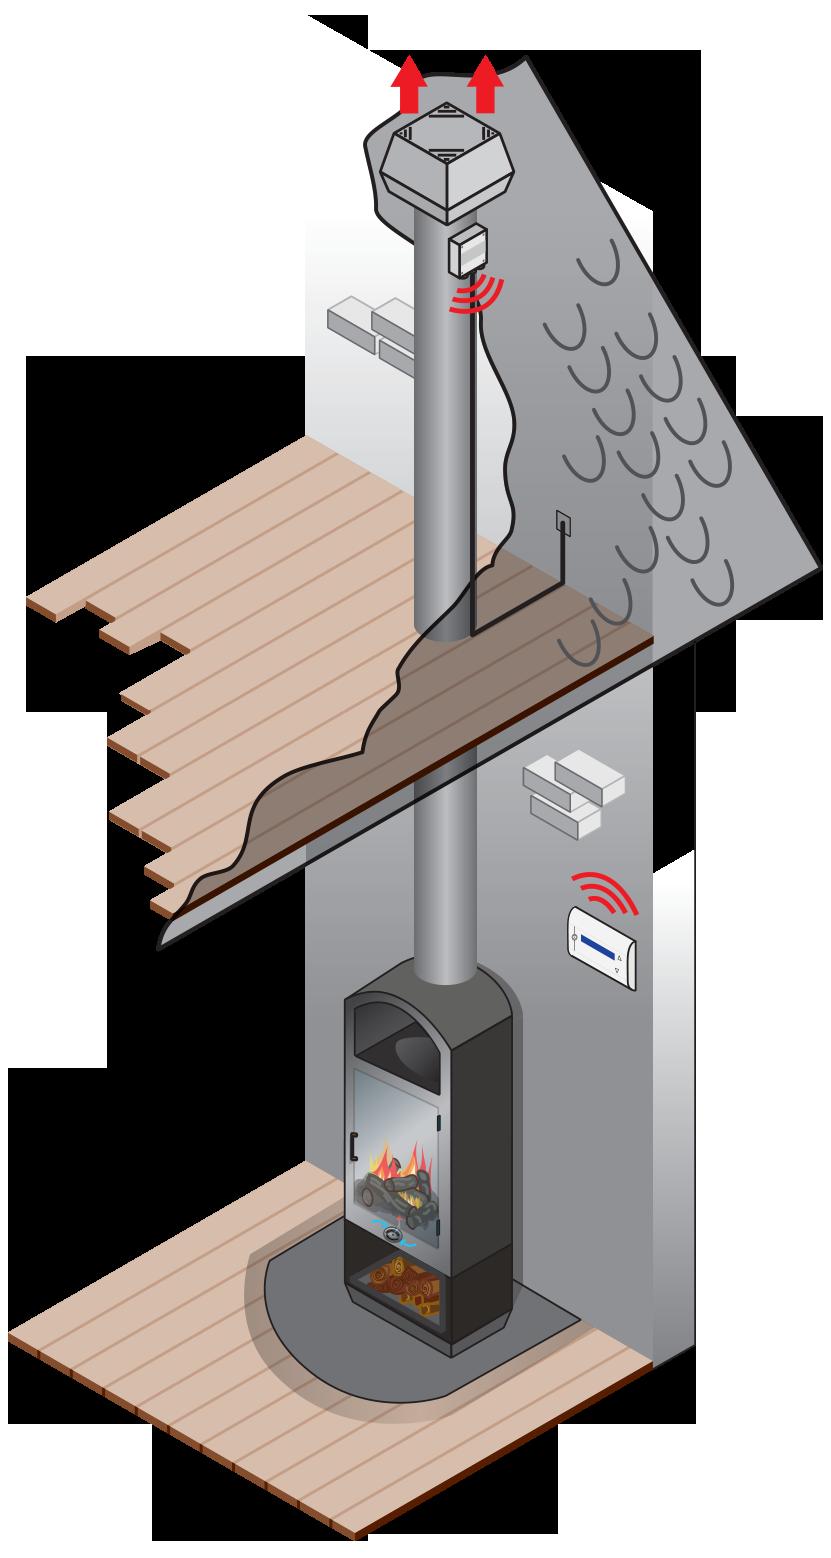 Solid fuel illustration